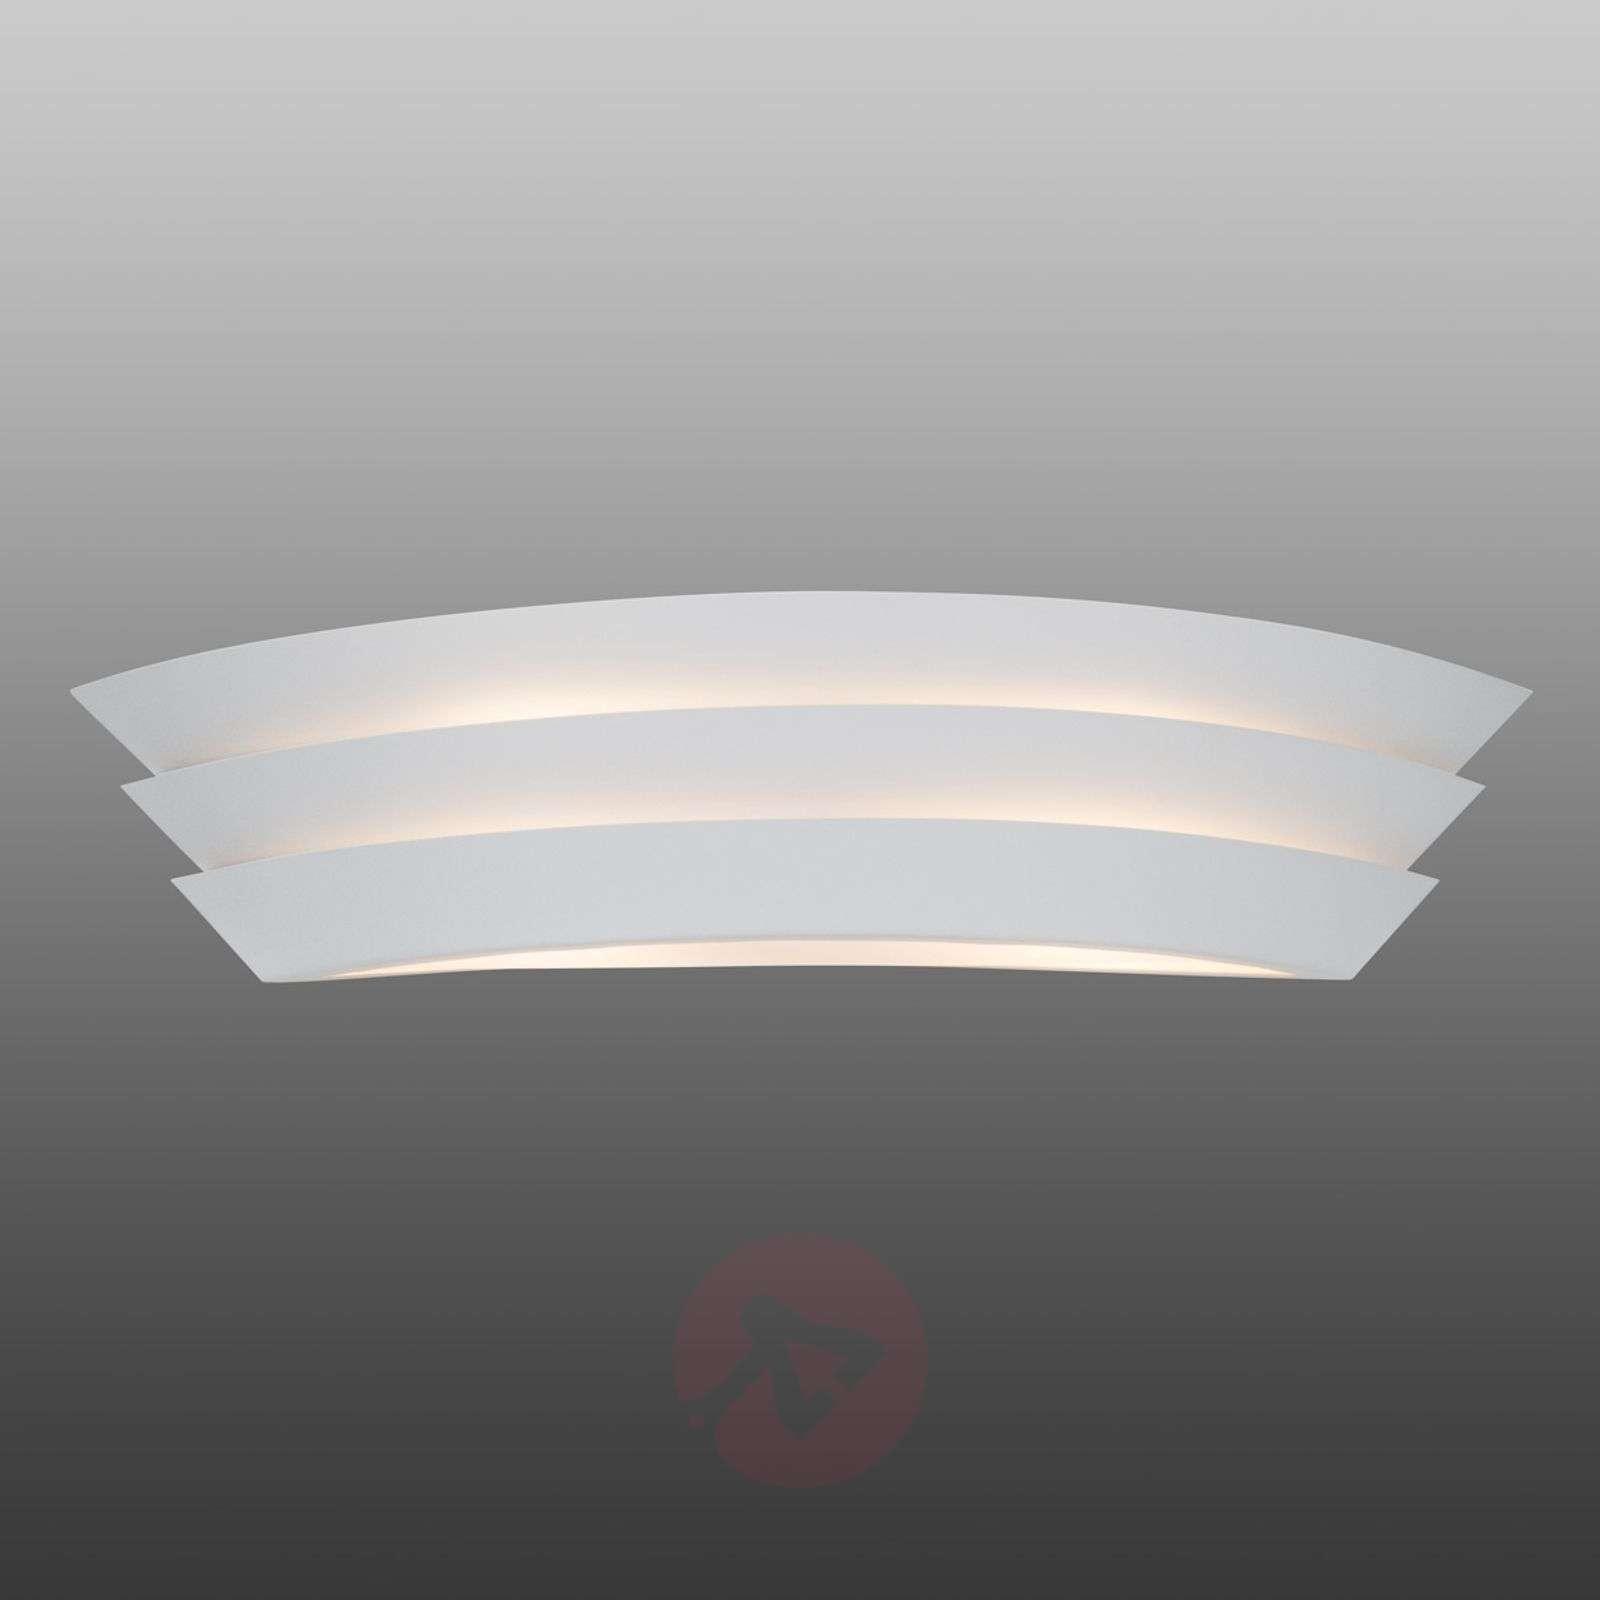 Ship wall light with beautiful lighting effects_1508947_1